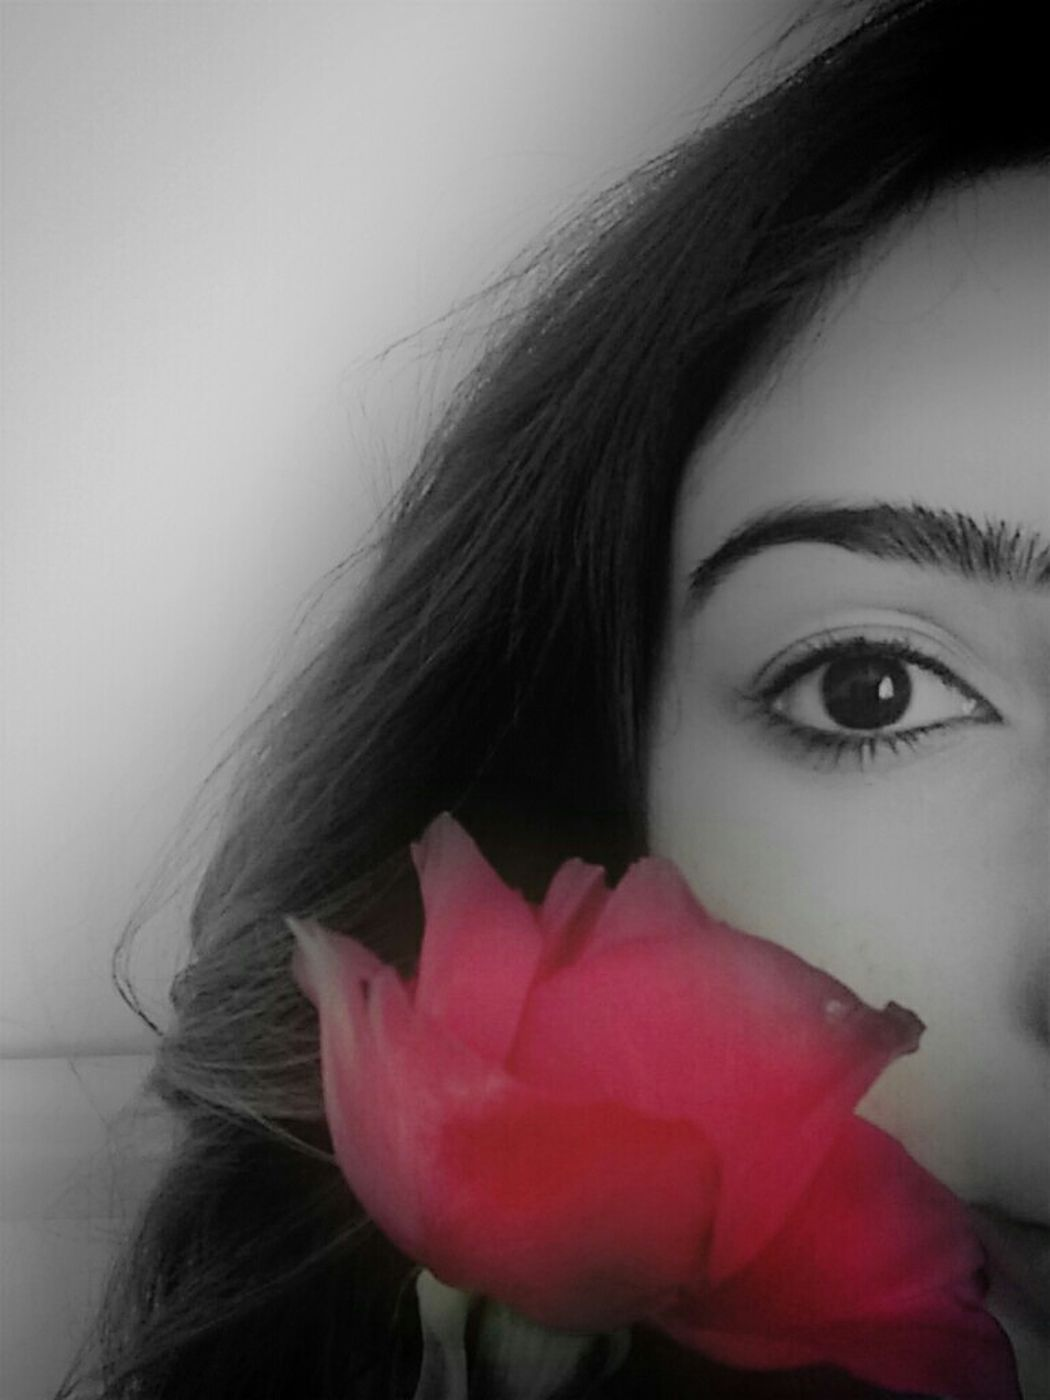 Blackeyes Rose♥ Love ♥ Life